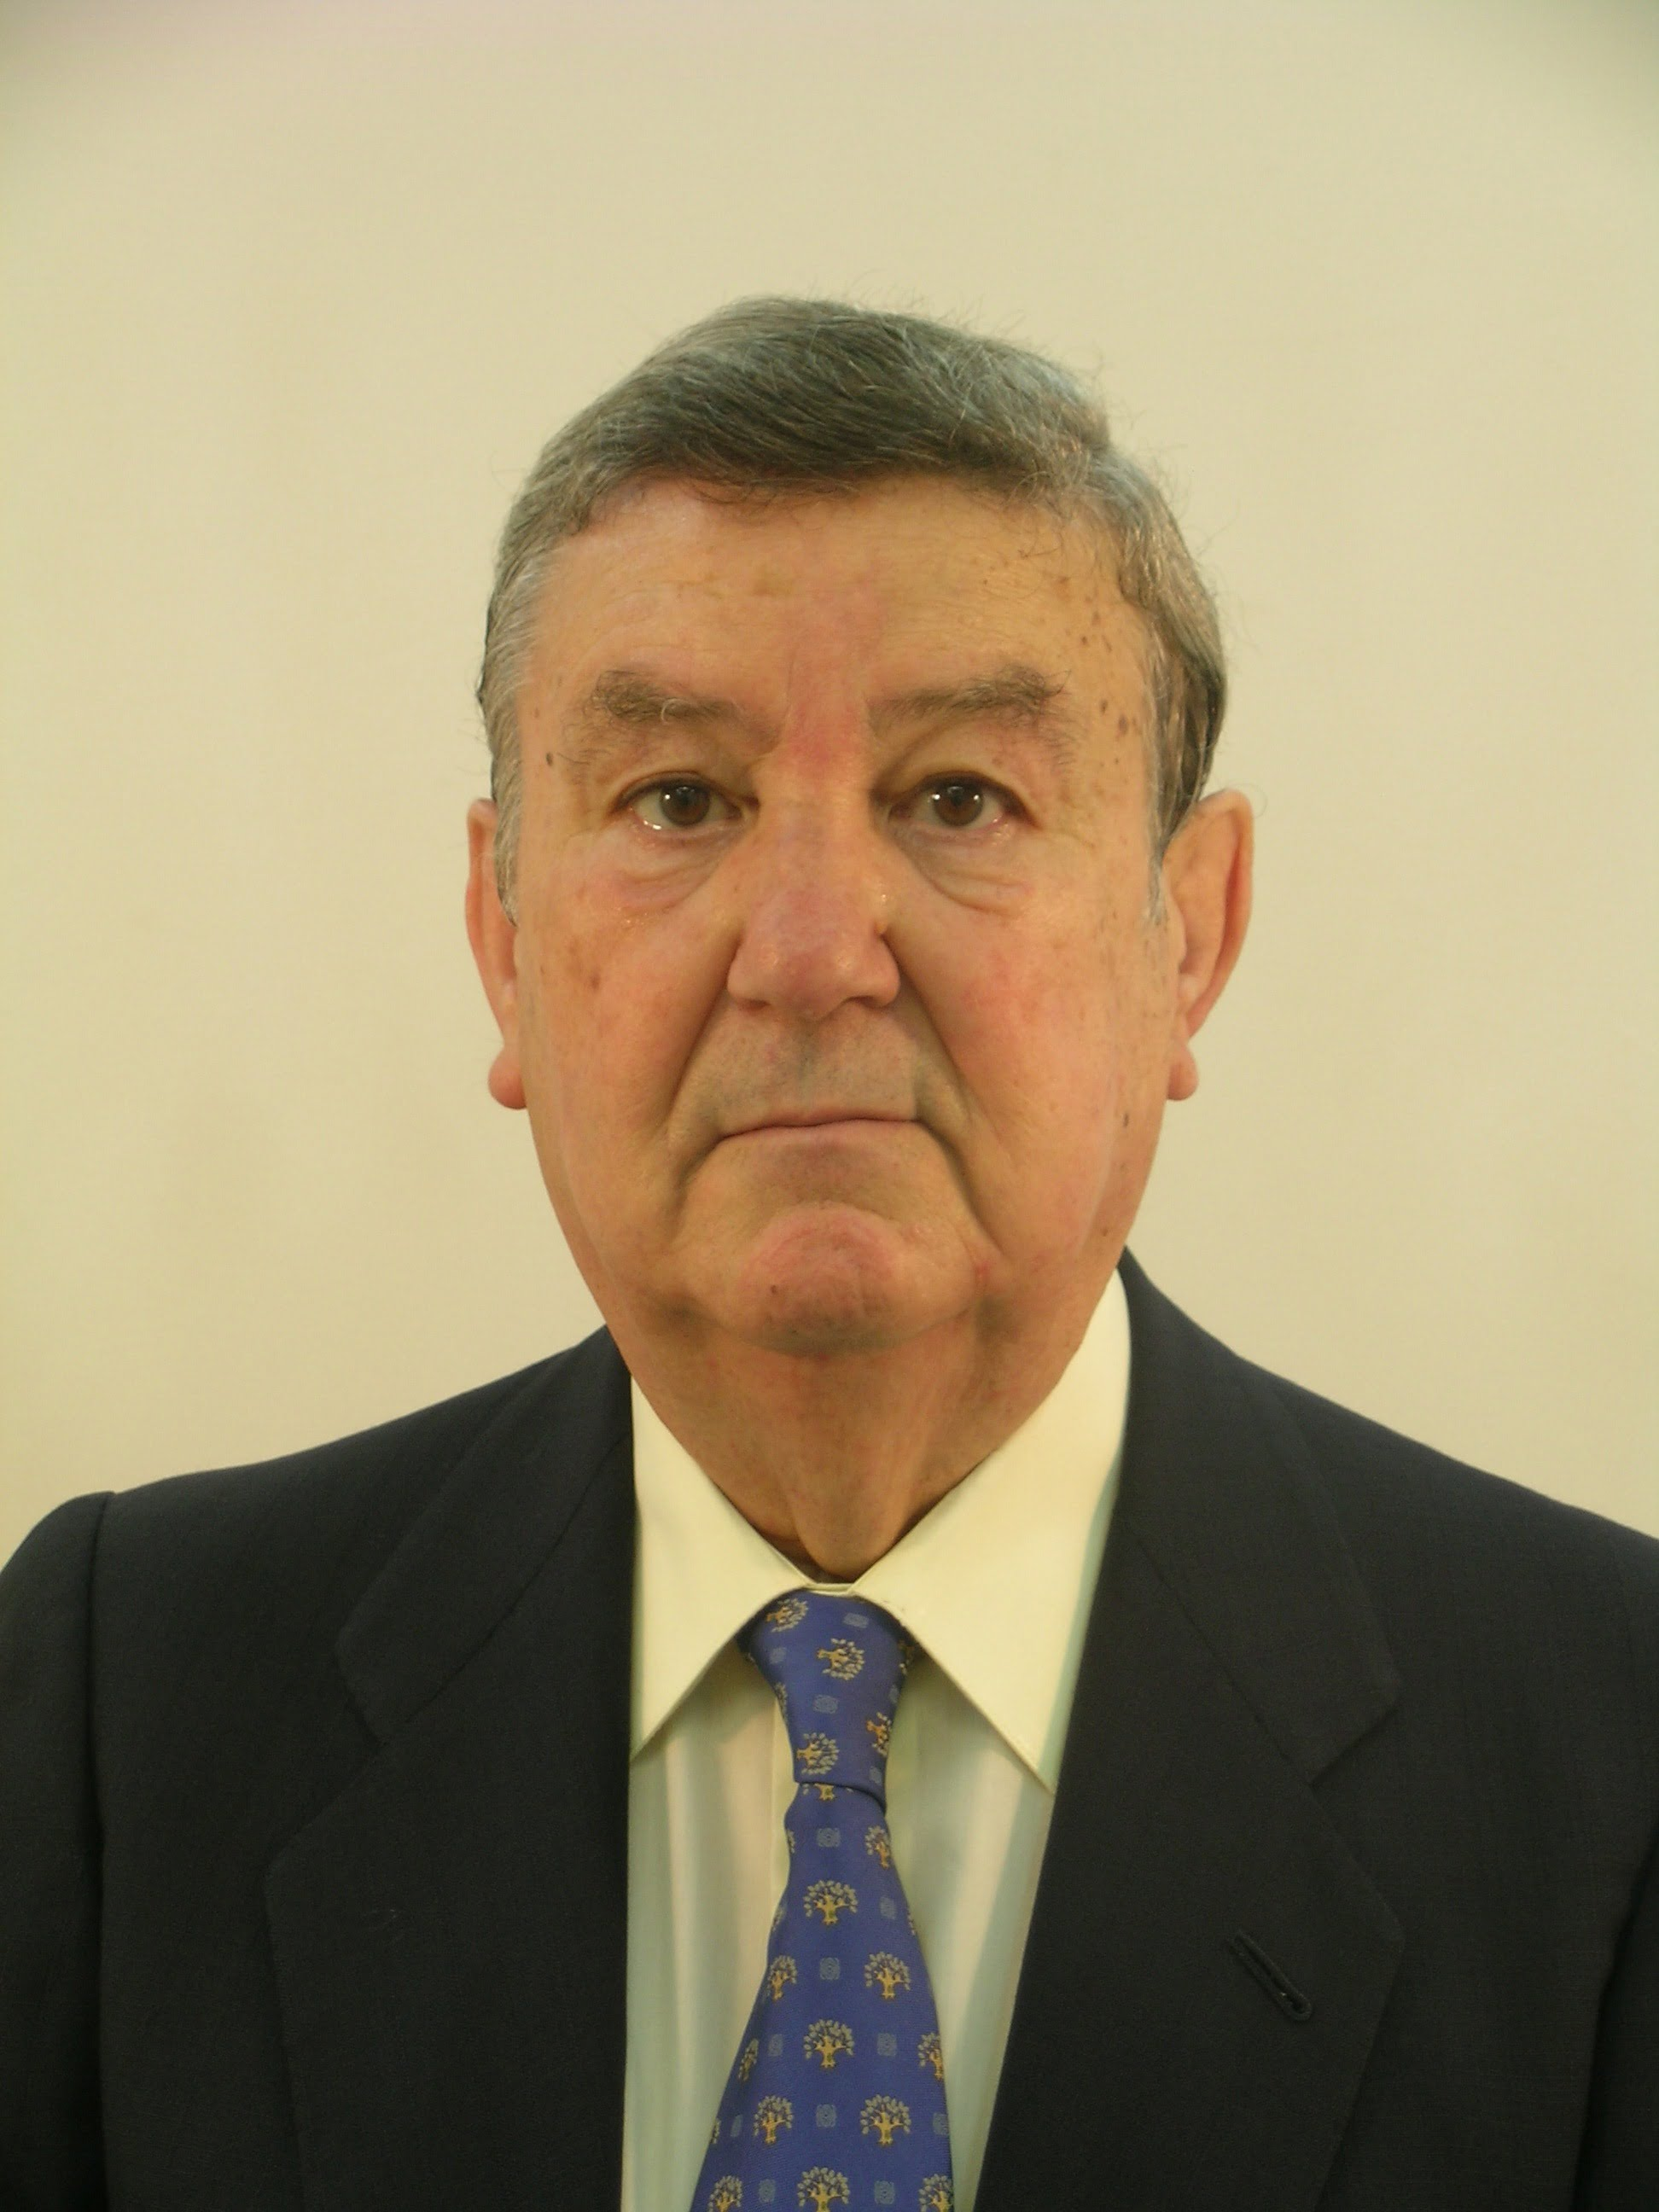 Sr. José Fernández Zamorano